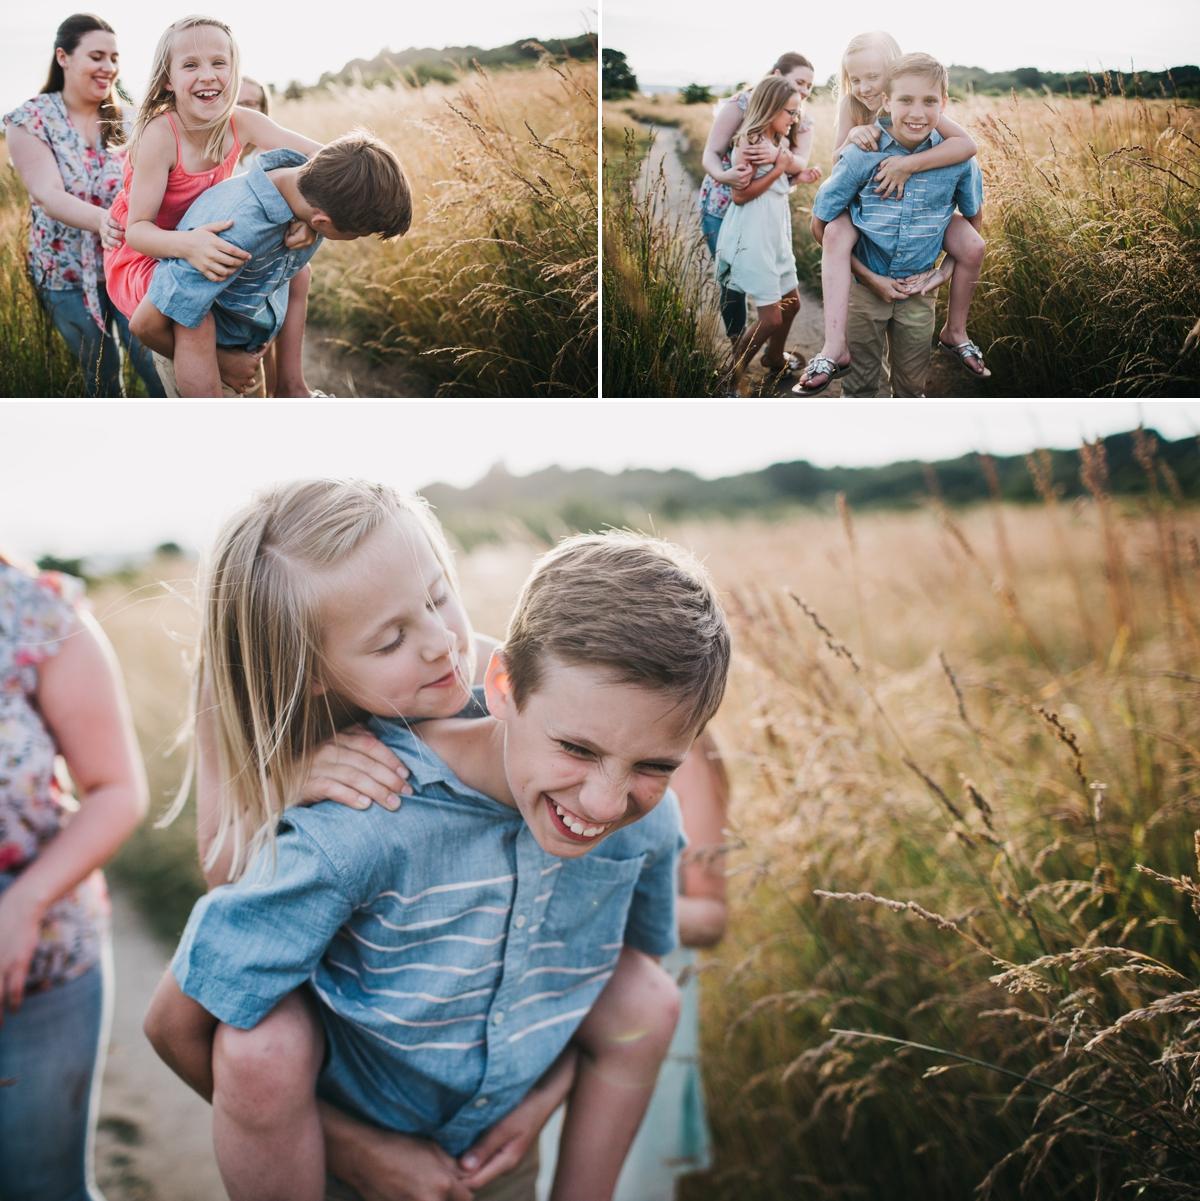 Seattle Family Photo Shoot